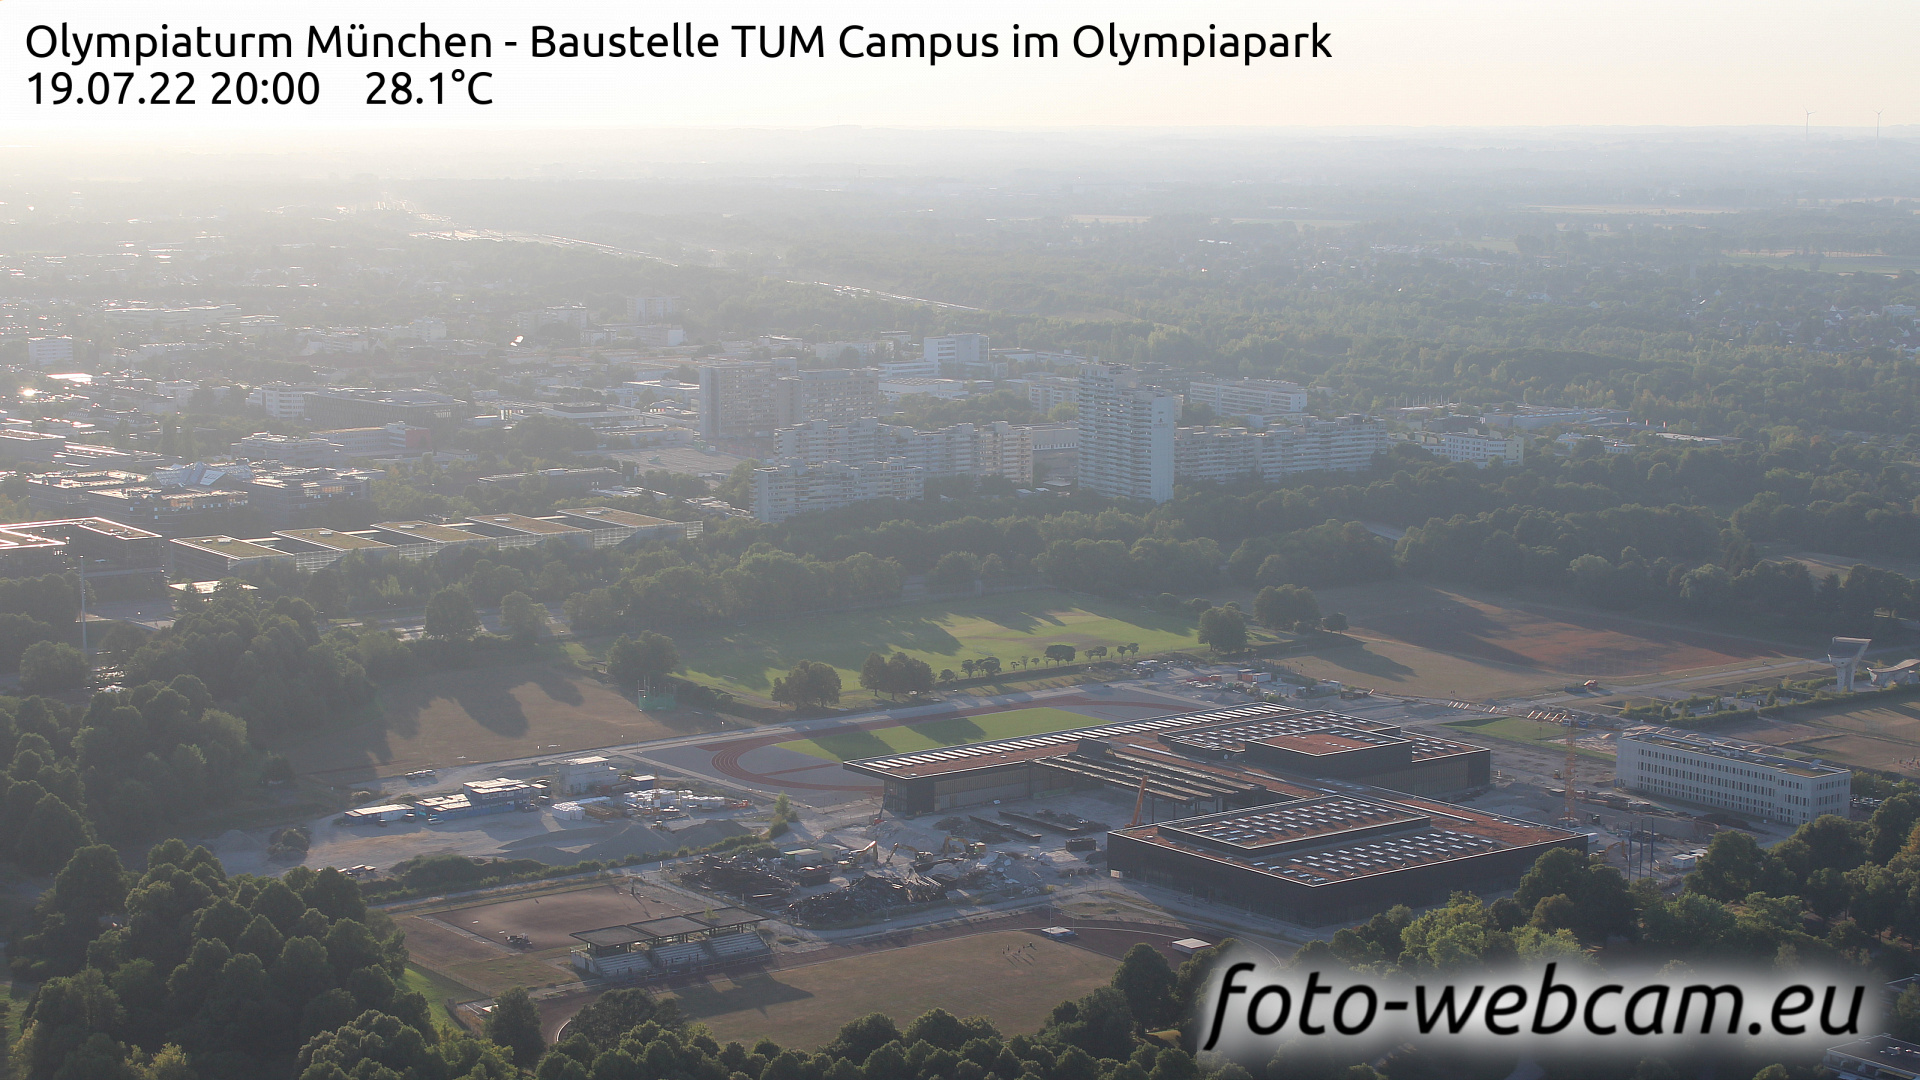 Munich Tue. 20:30